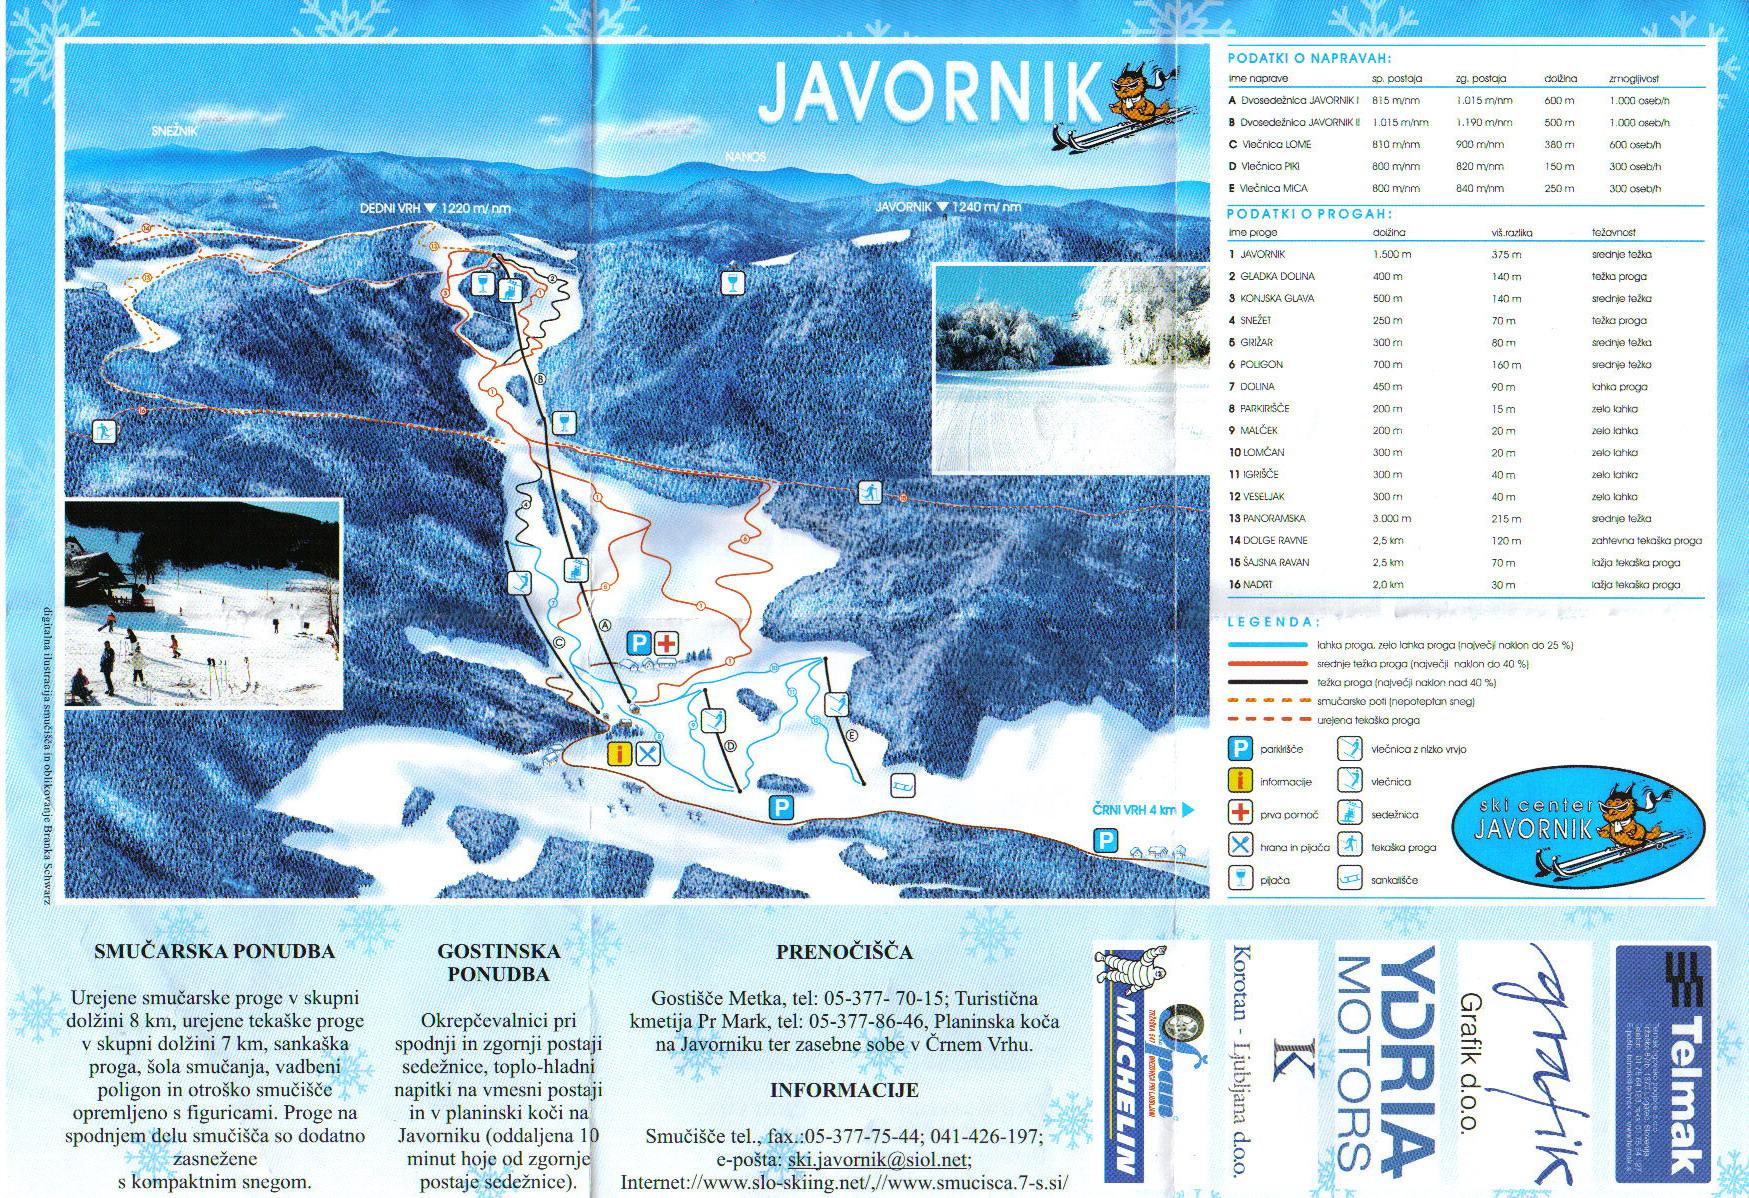 Javornik - Crni Vrh Piste / Trail Map